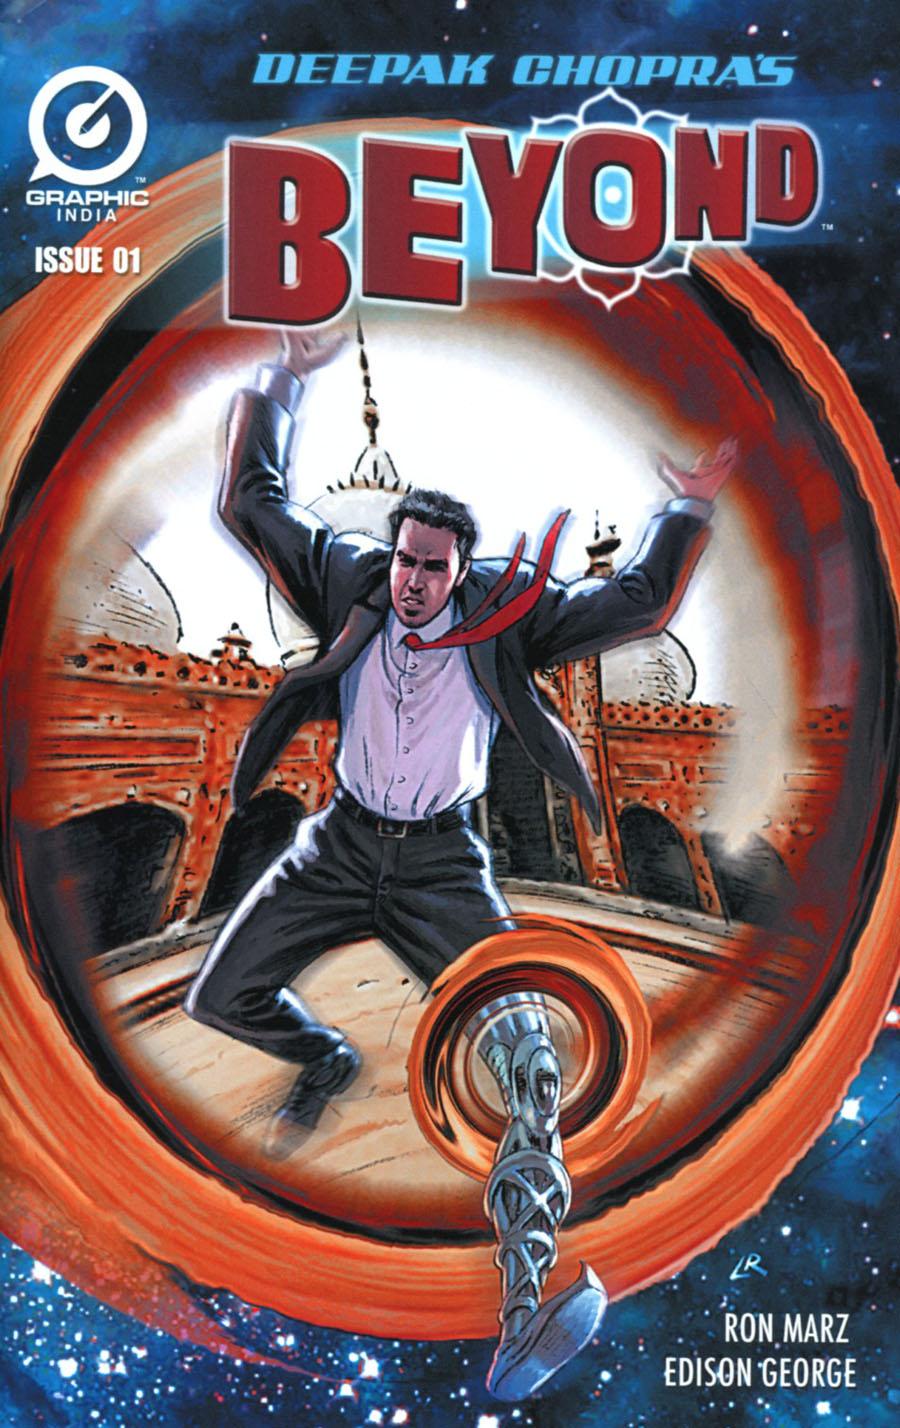 Deepak Chopras Beyond Vol 2 #1